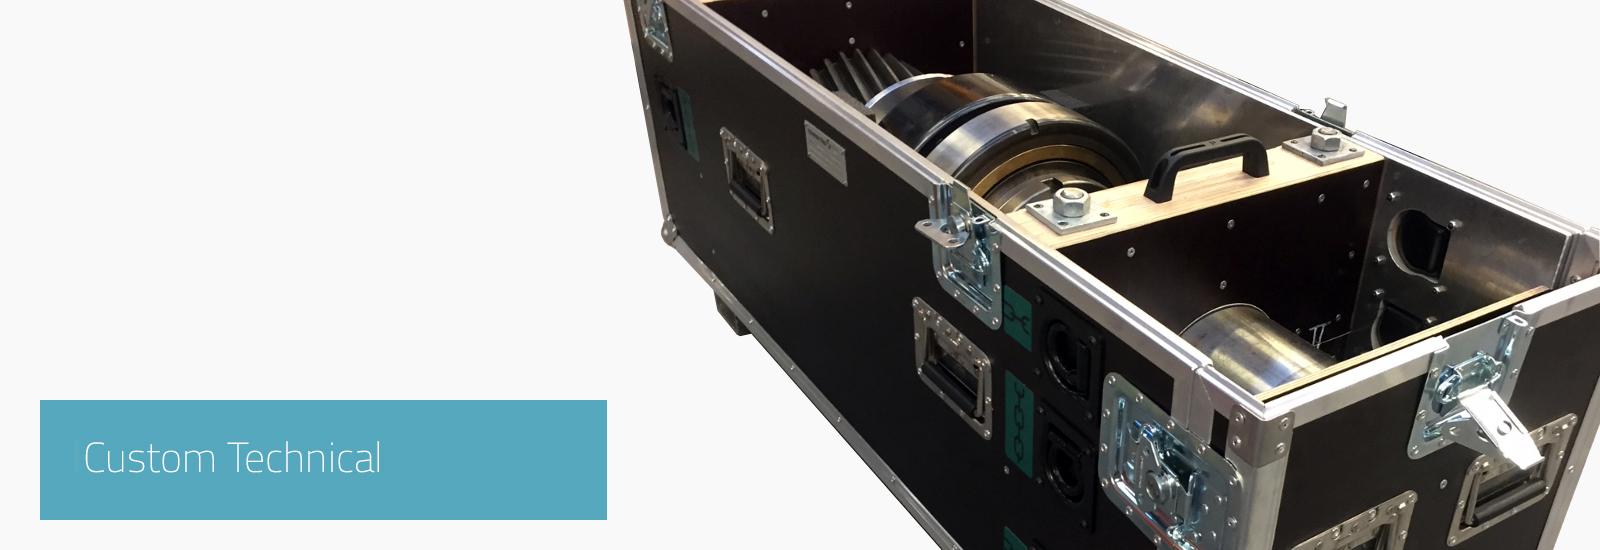 Flightcases International A/S - Peli Cases